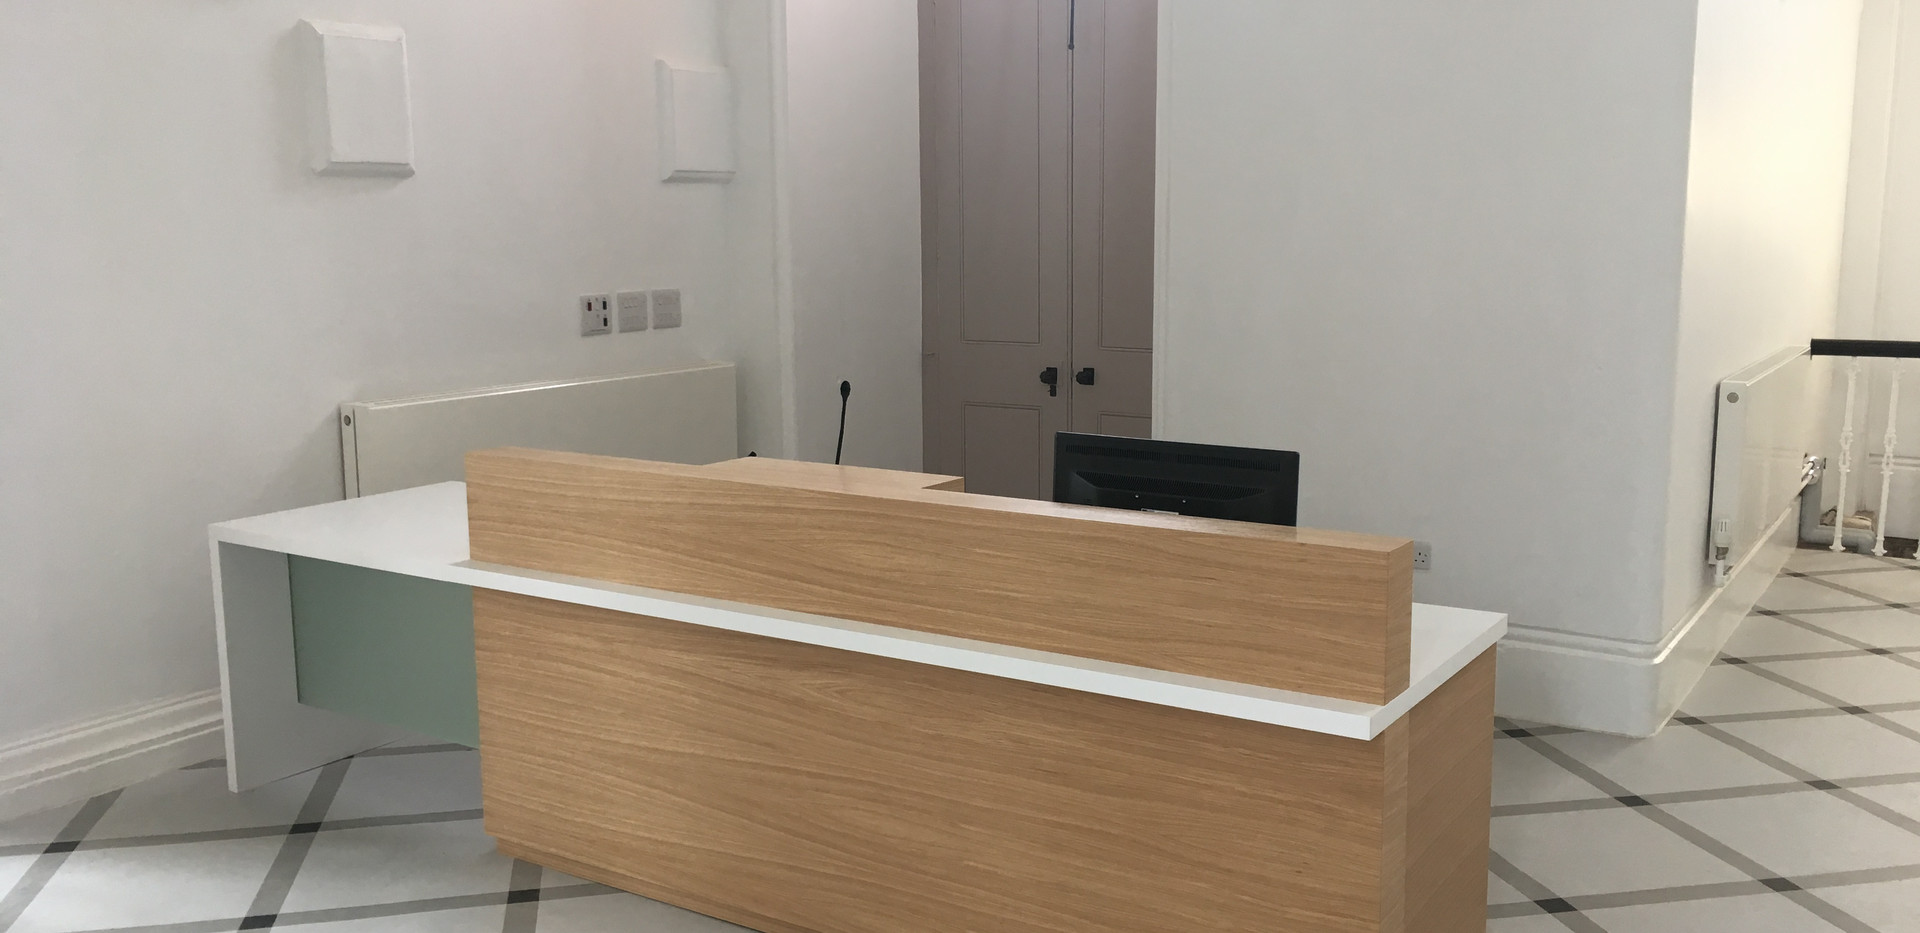 Netley Chapel Reception Desk